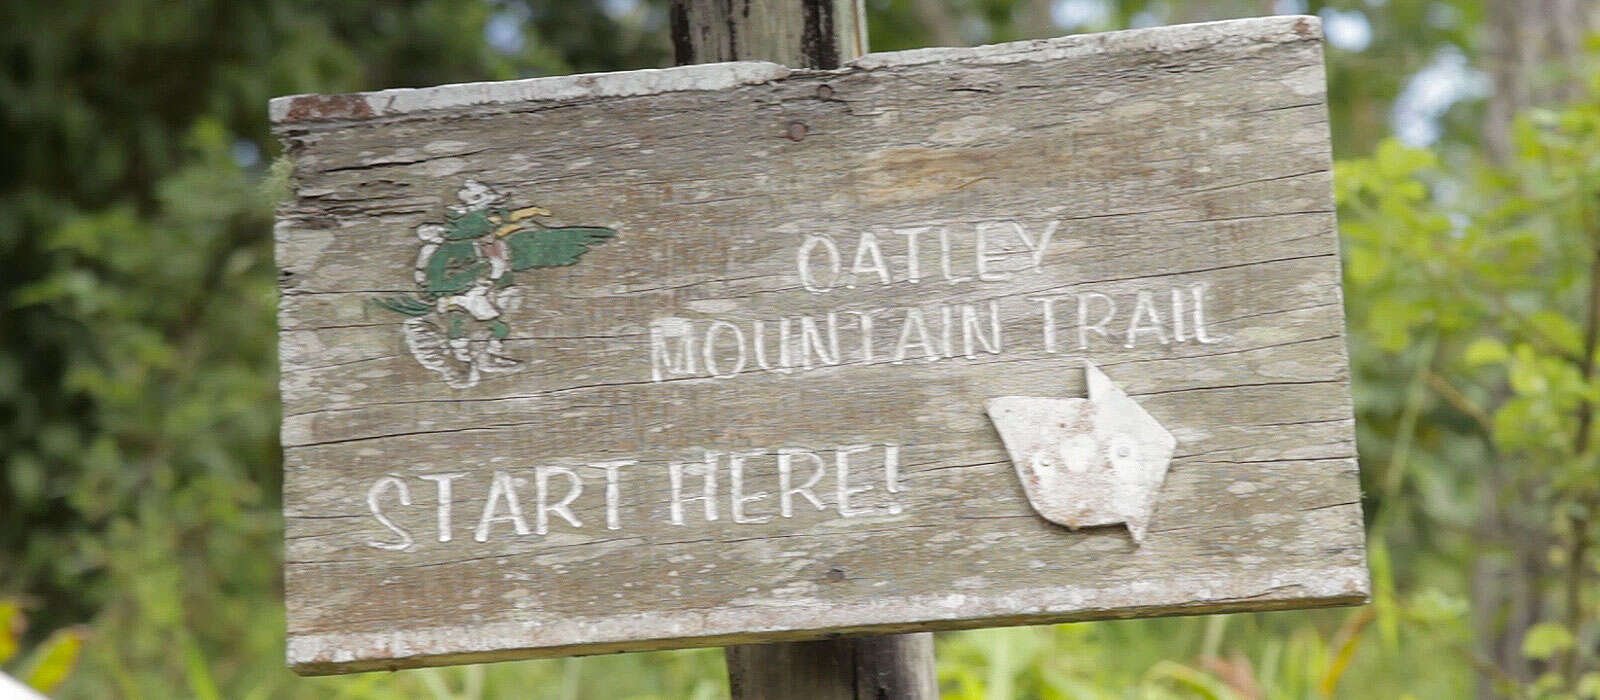 Explore the Holywell Recreation Area